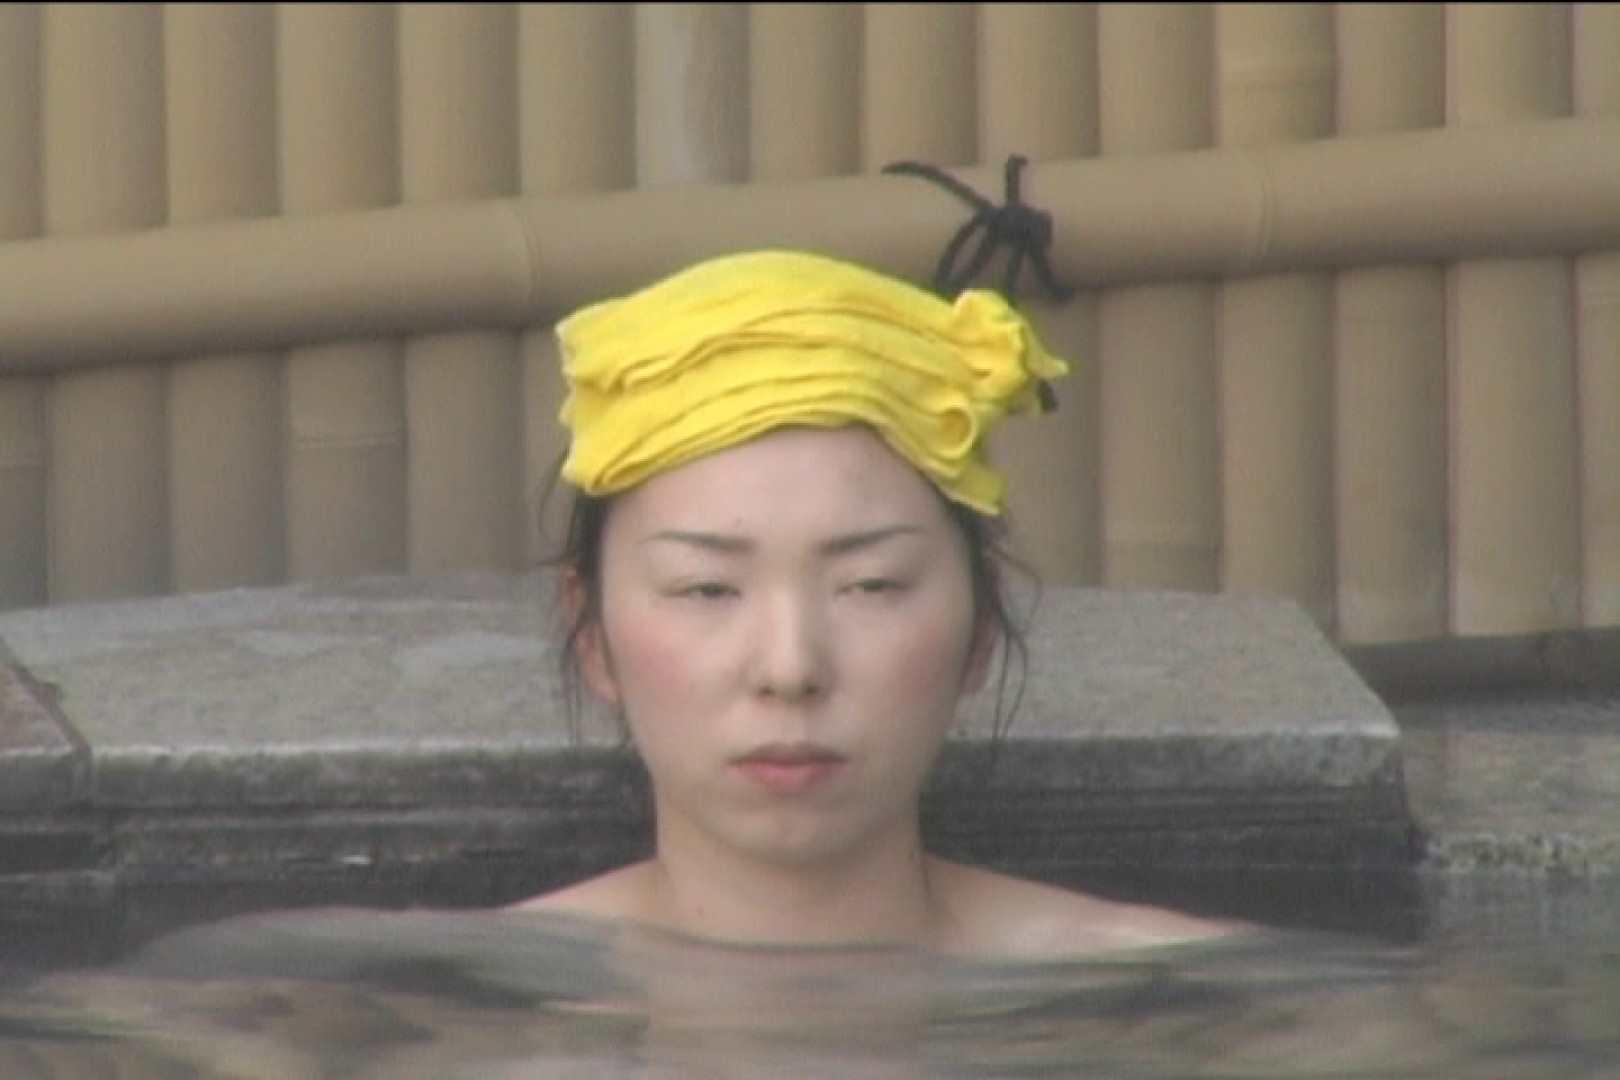 Aquaな露天風呂Vol.529 OLのエロ生活 おめこ無修正画像 42連発 17